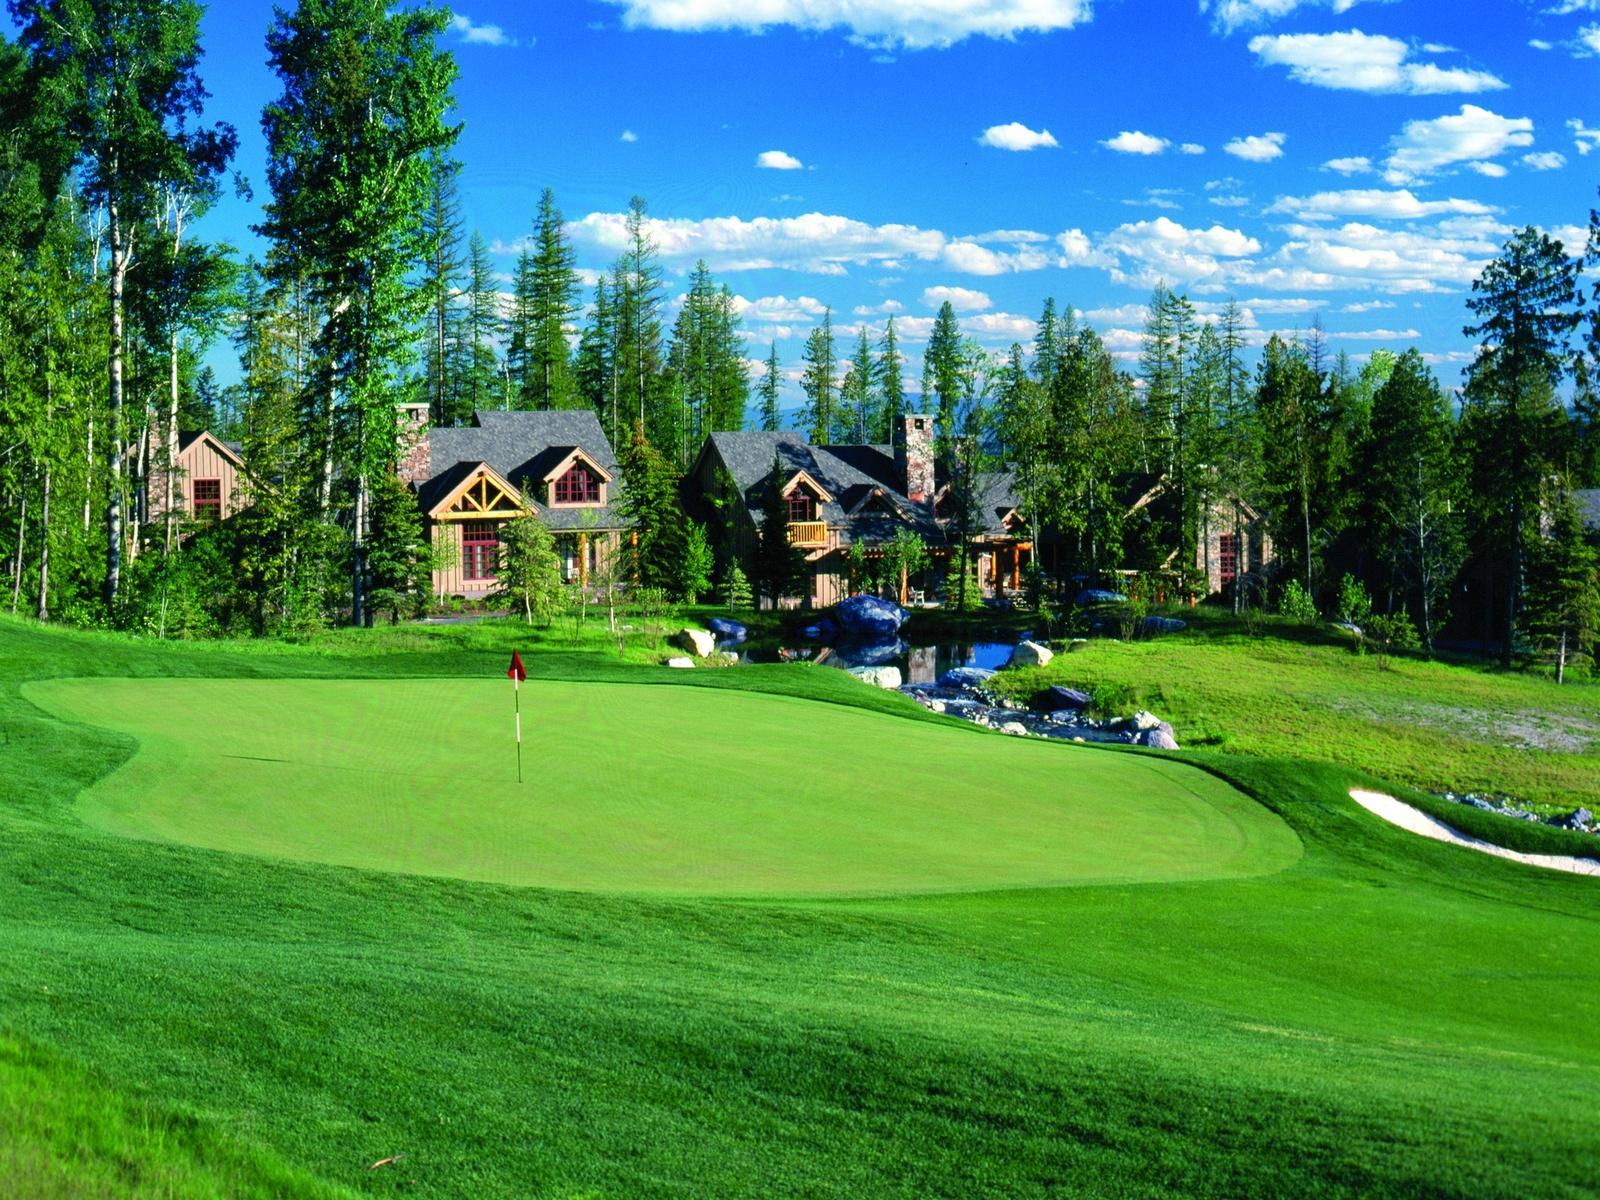 Additional photo for property listing at 145-153 S Prairiesmoke Cir , Whitefish, MT 59937  Whitefish, Montana 59937 United States